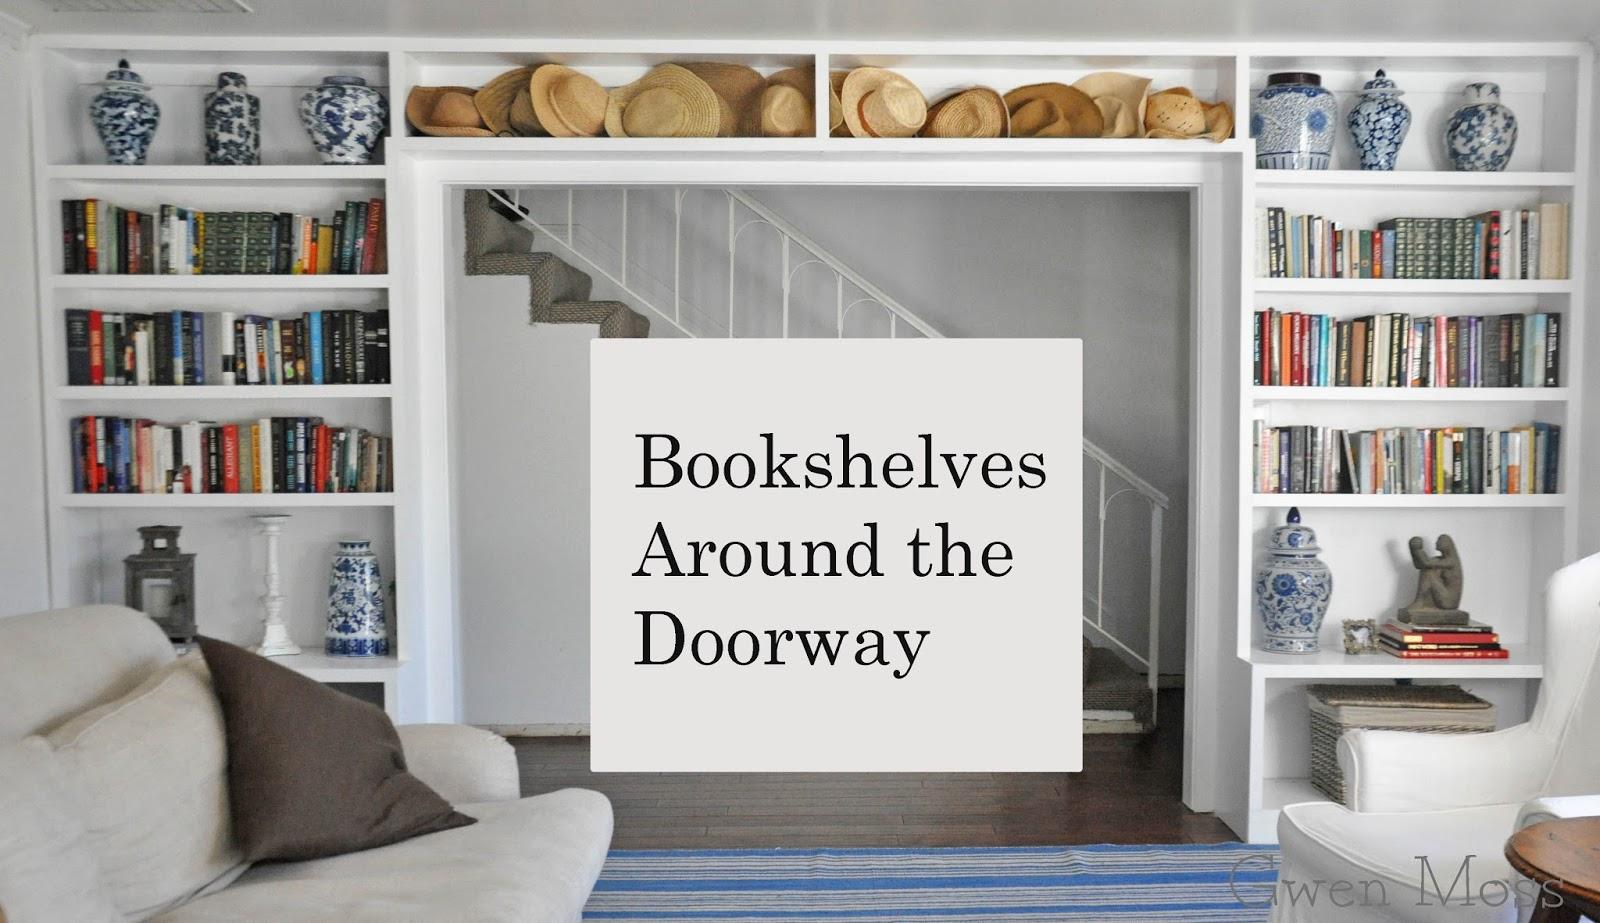 Gwen Moss: My Living Room Update- adding built-in bookshelves